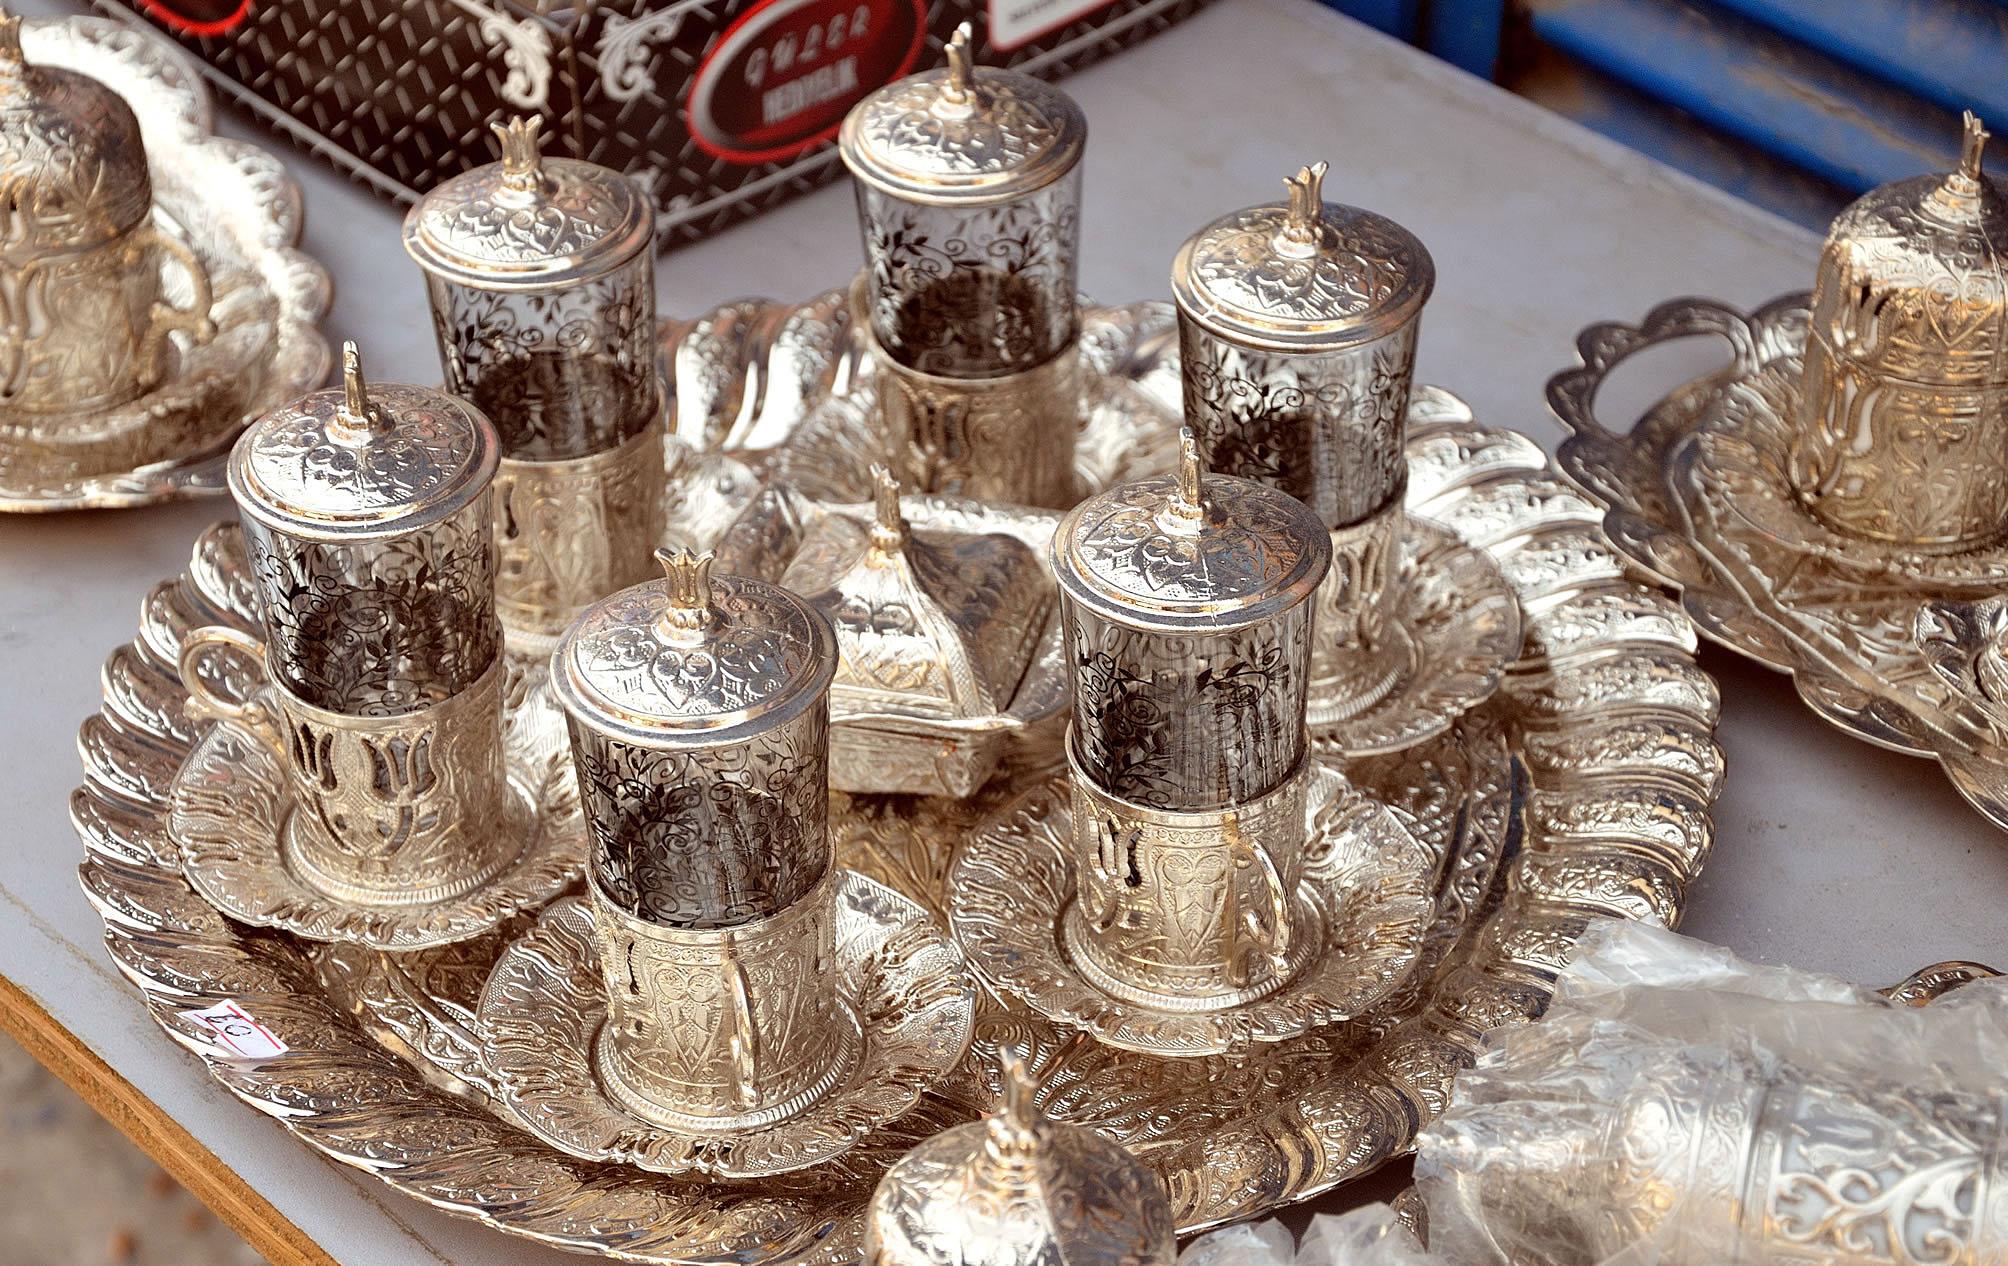 turkish souvenirs Сувениры из Стамбула: чайный набор